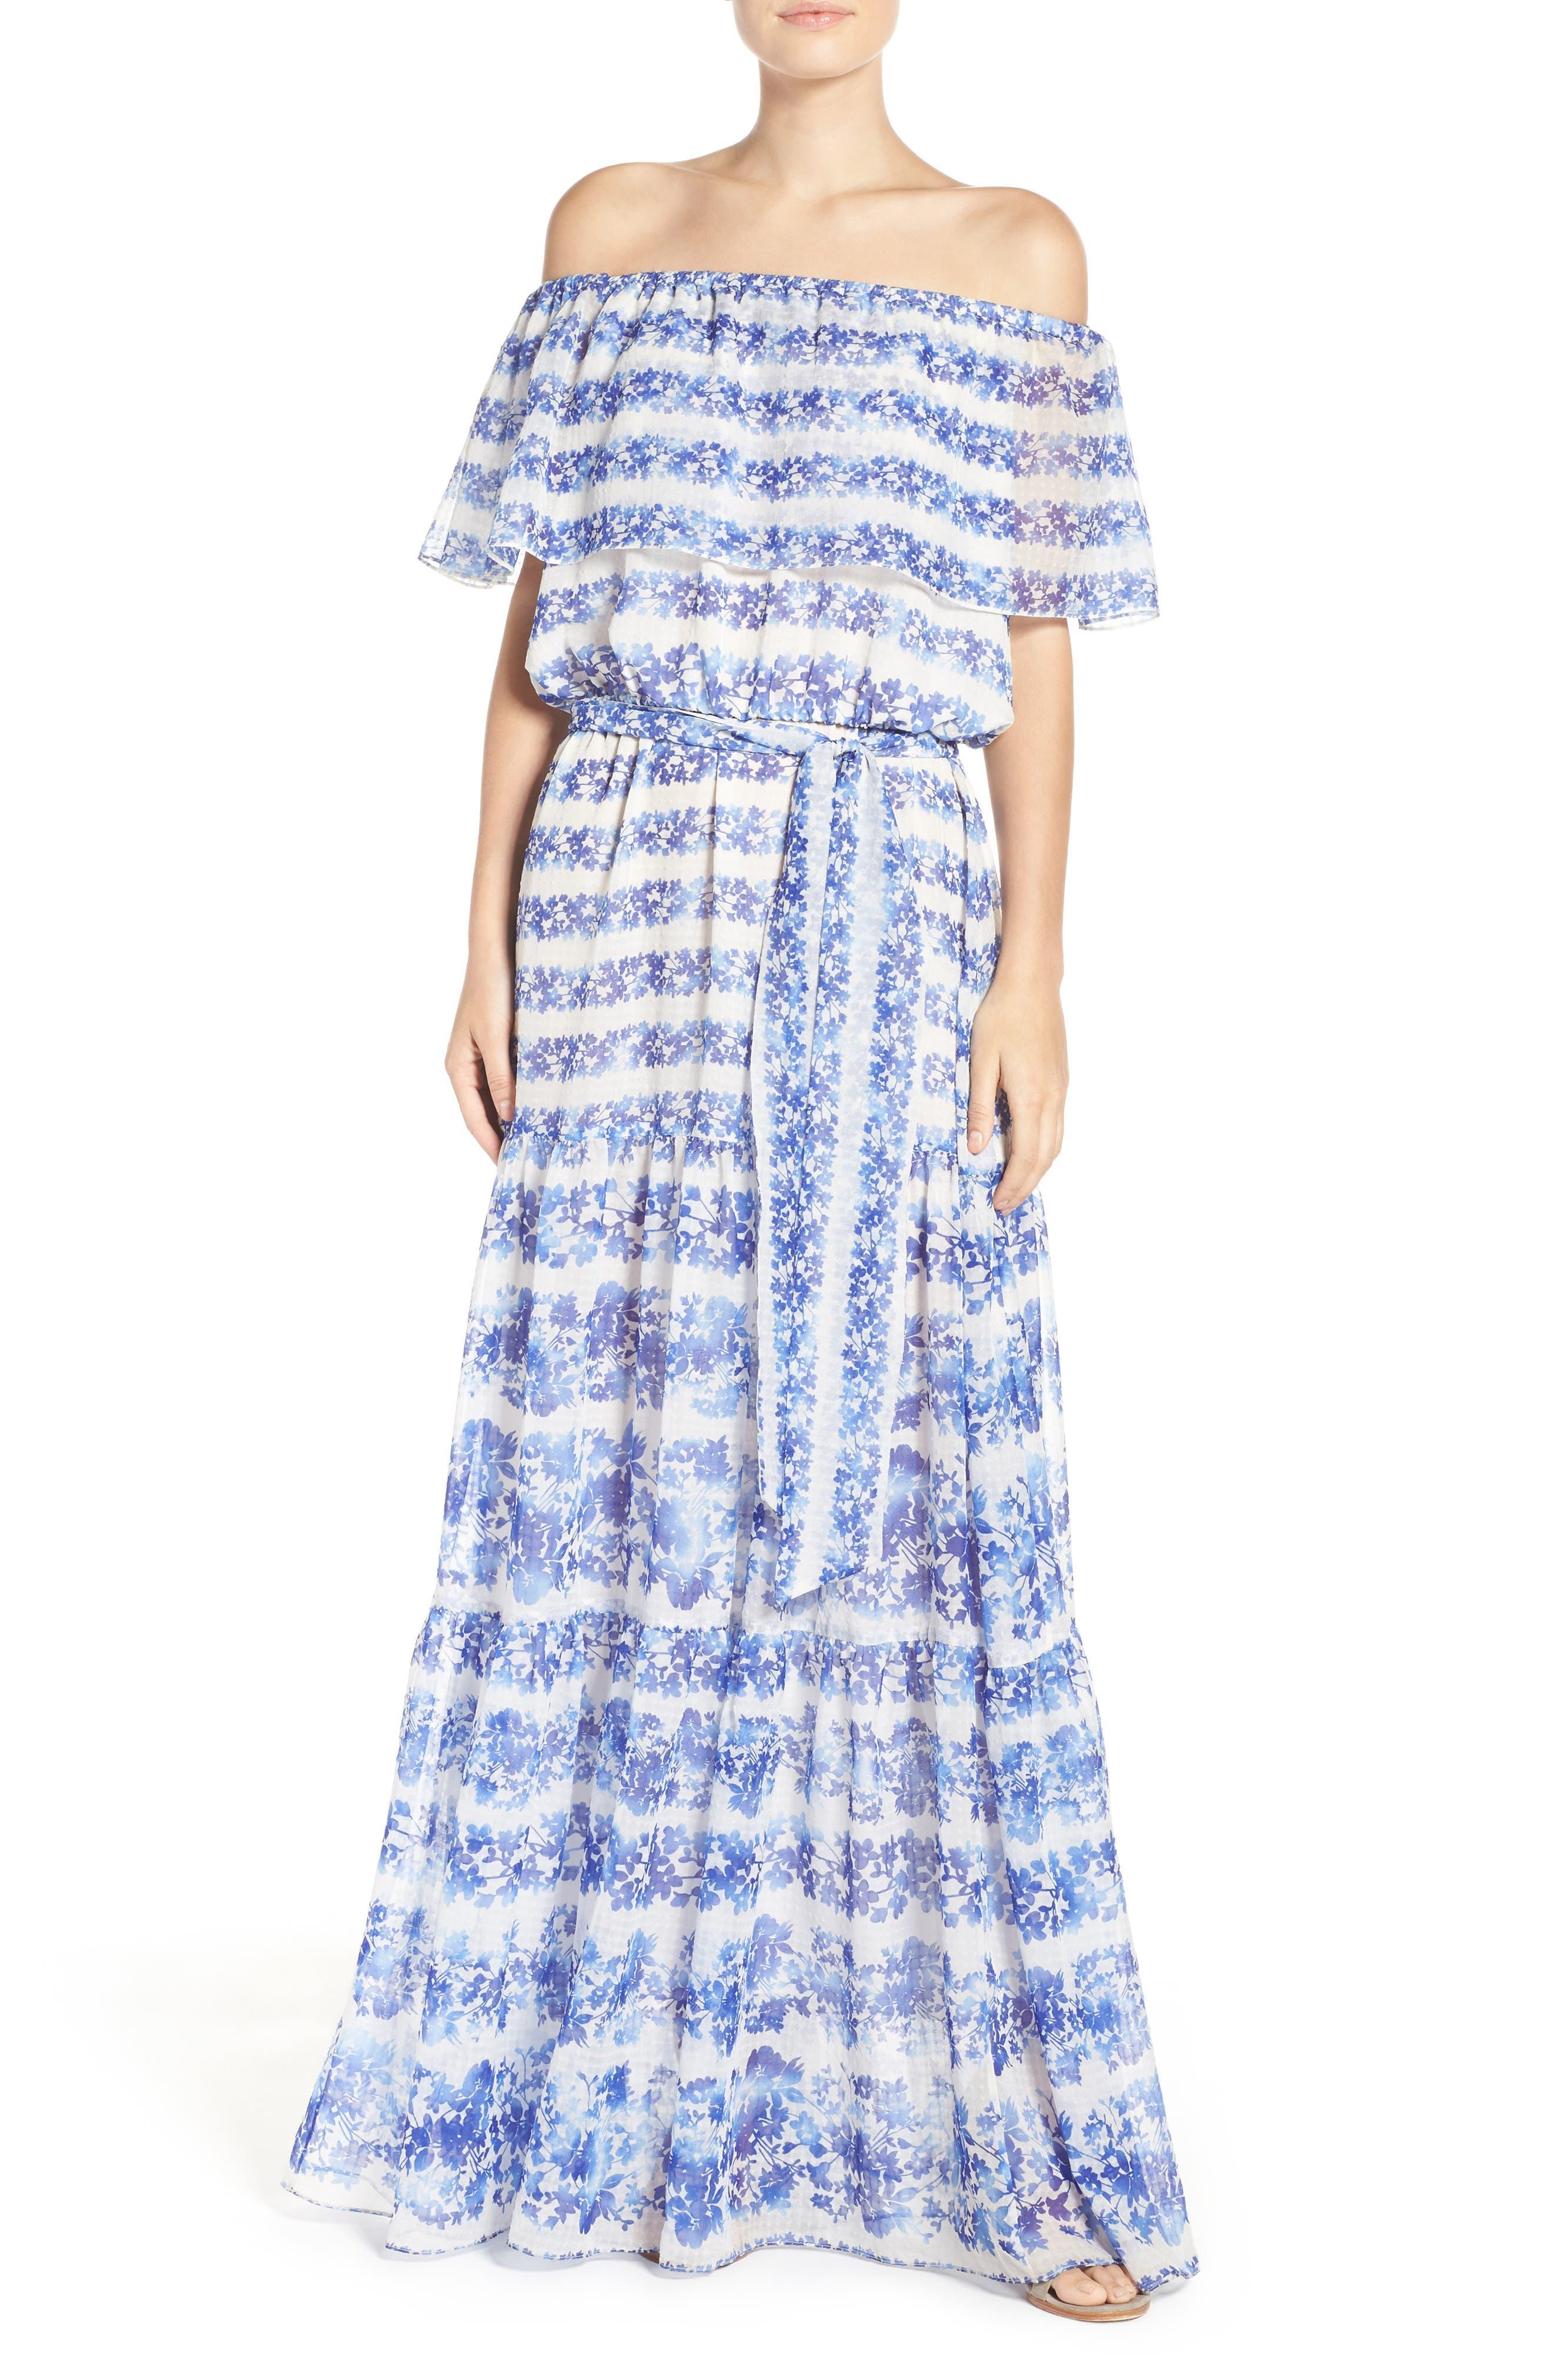 ELIZA J, Blouson Maxi Dress, Main thumbnail 1, color, 442